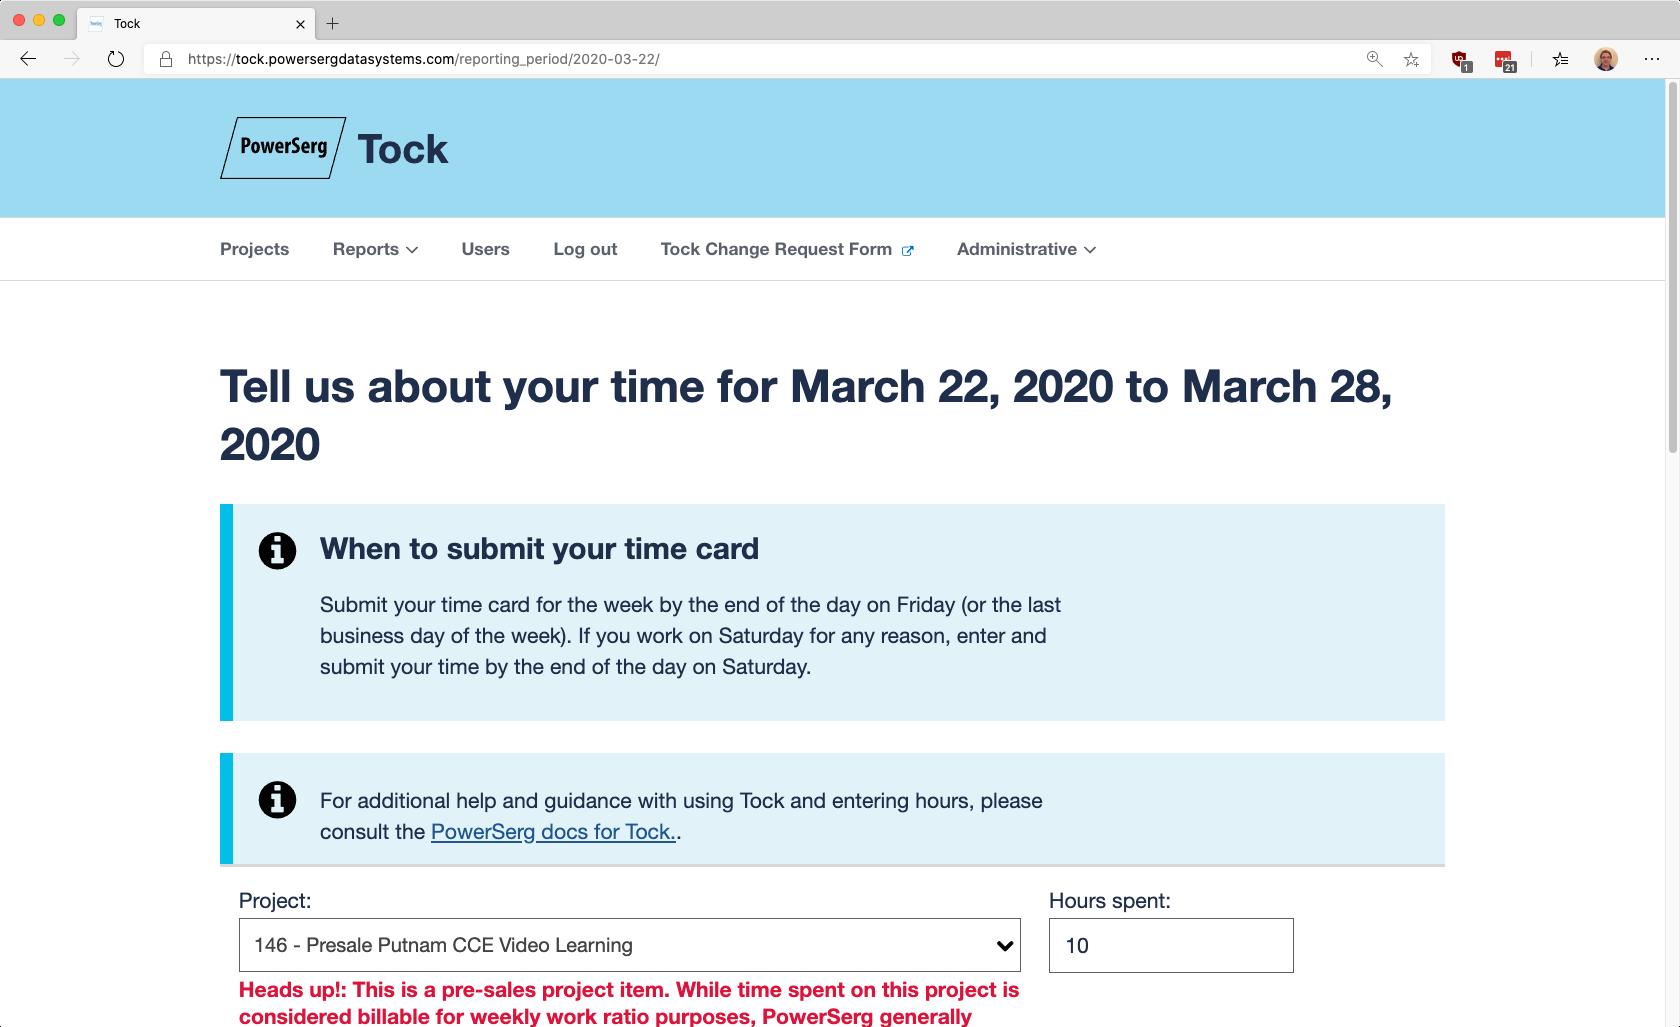 PowerSerg Tock Screenshot